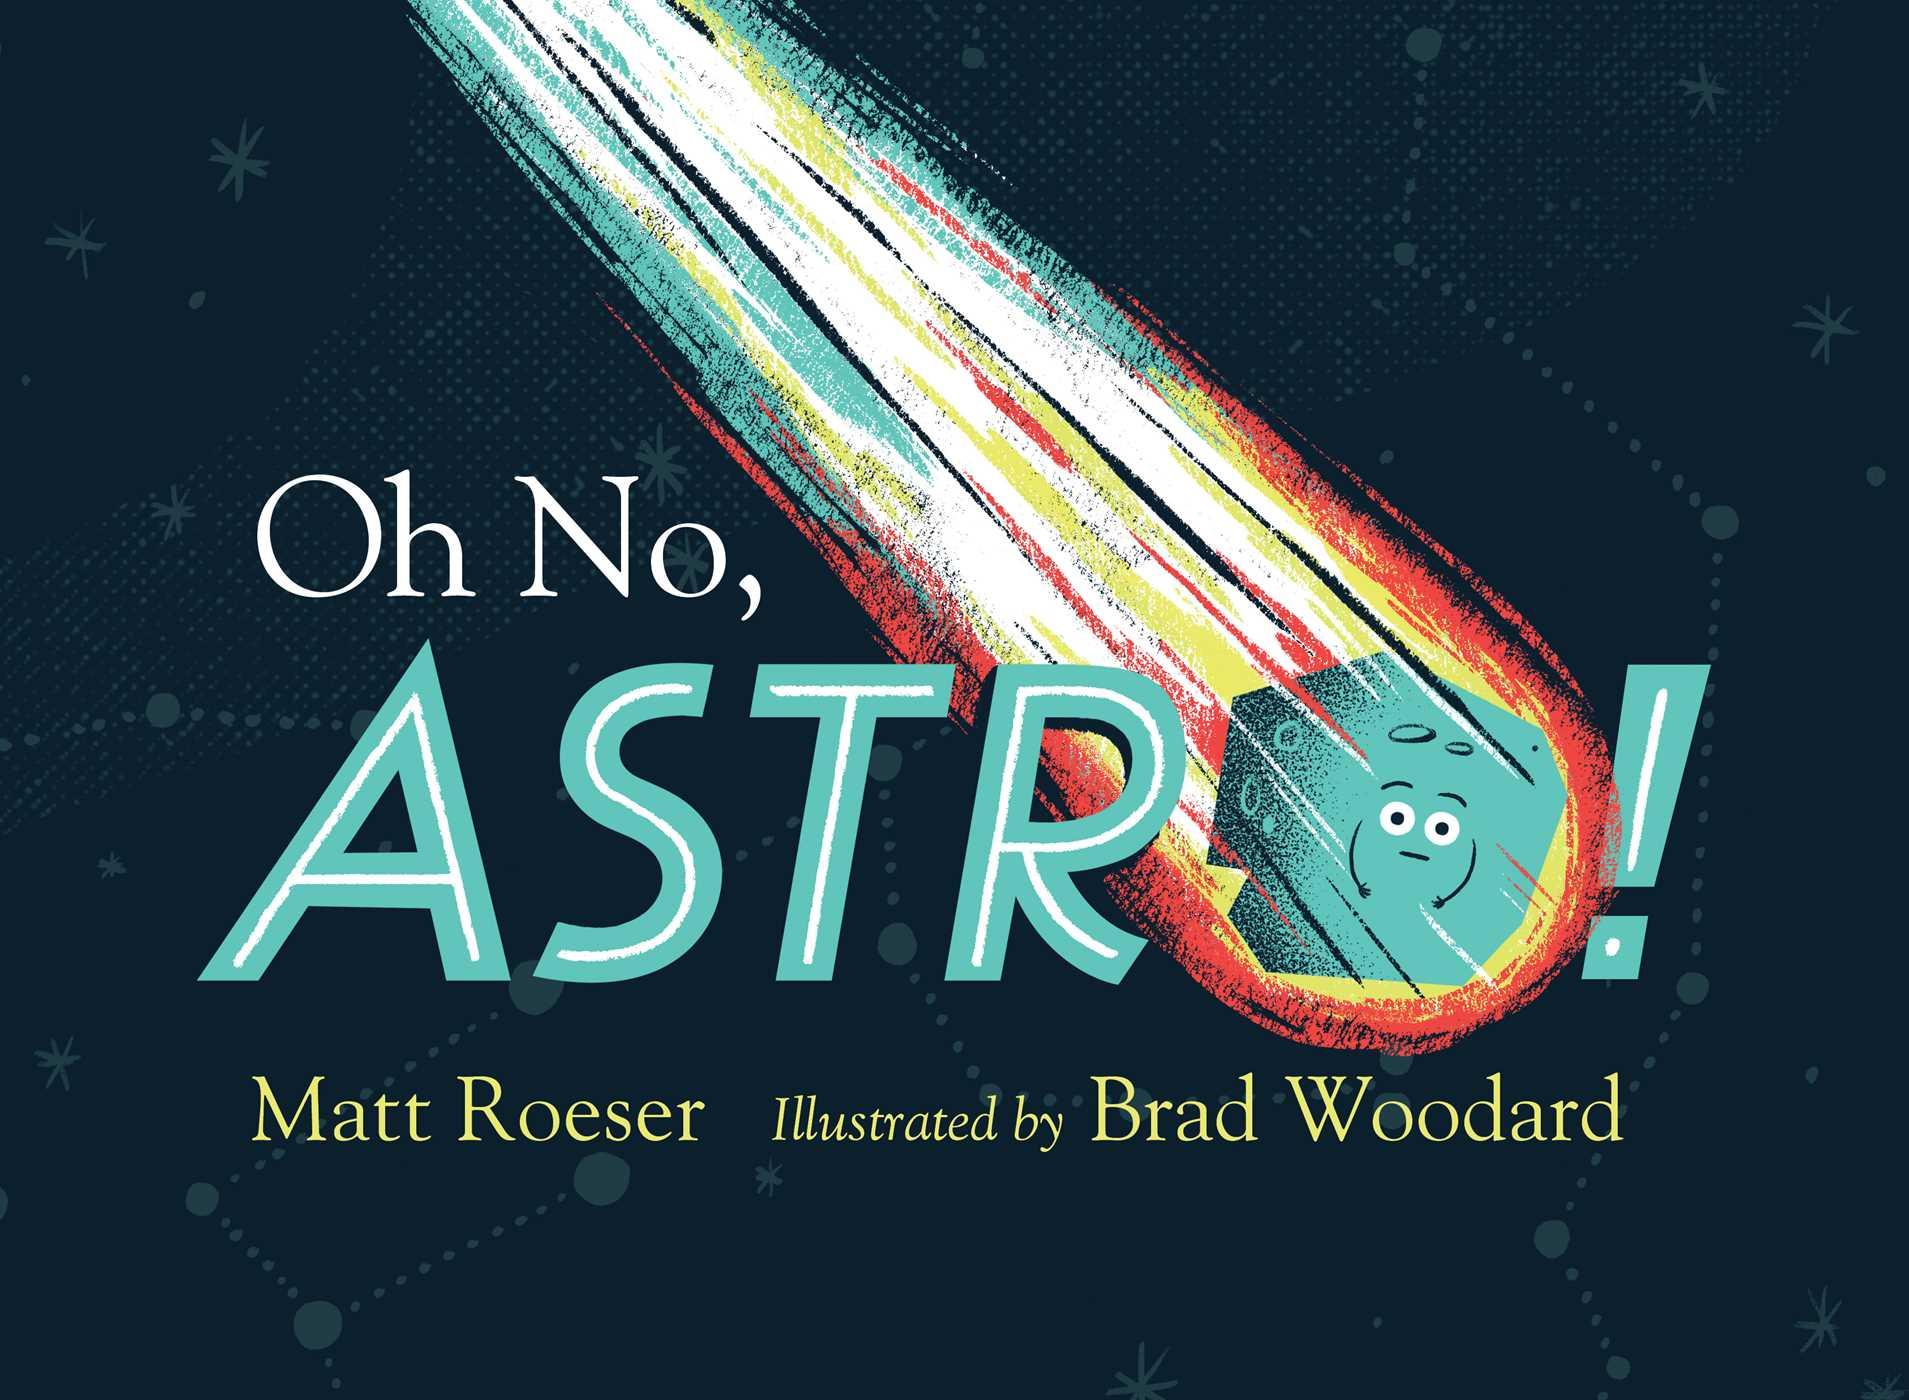 celebrate-picture-books-picture-book-review-oh-no-astro-cover